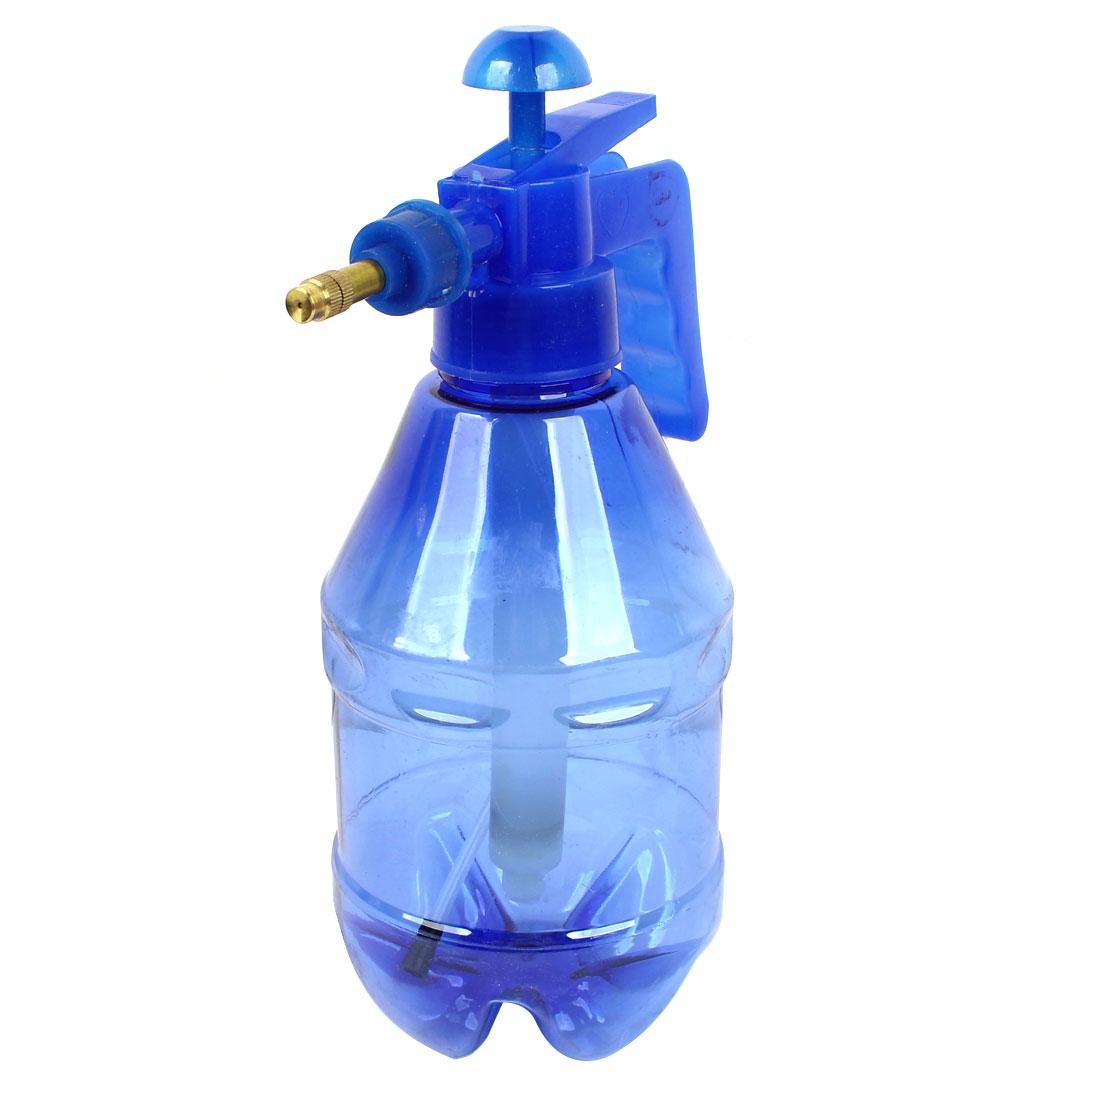 Car Blue Clean Washing Watering 0.8L Plastic Spray Spraying Bottle Water Pressure Sprayer